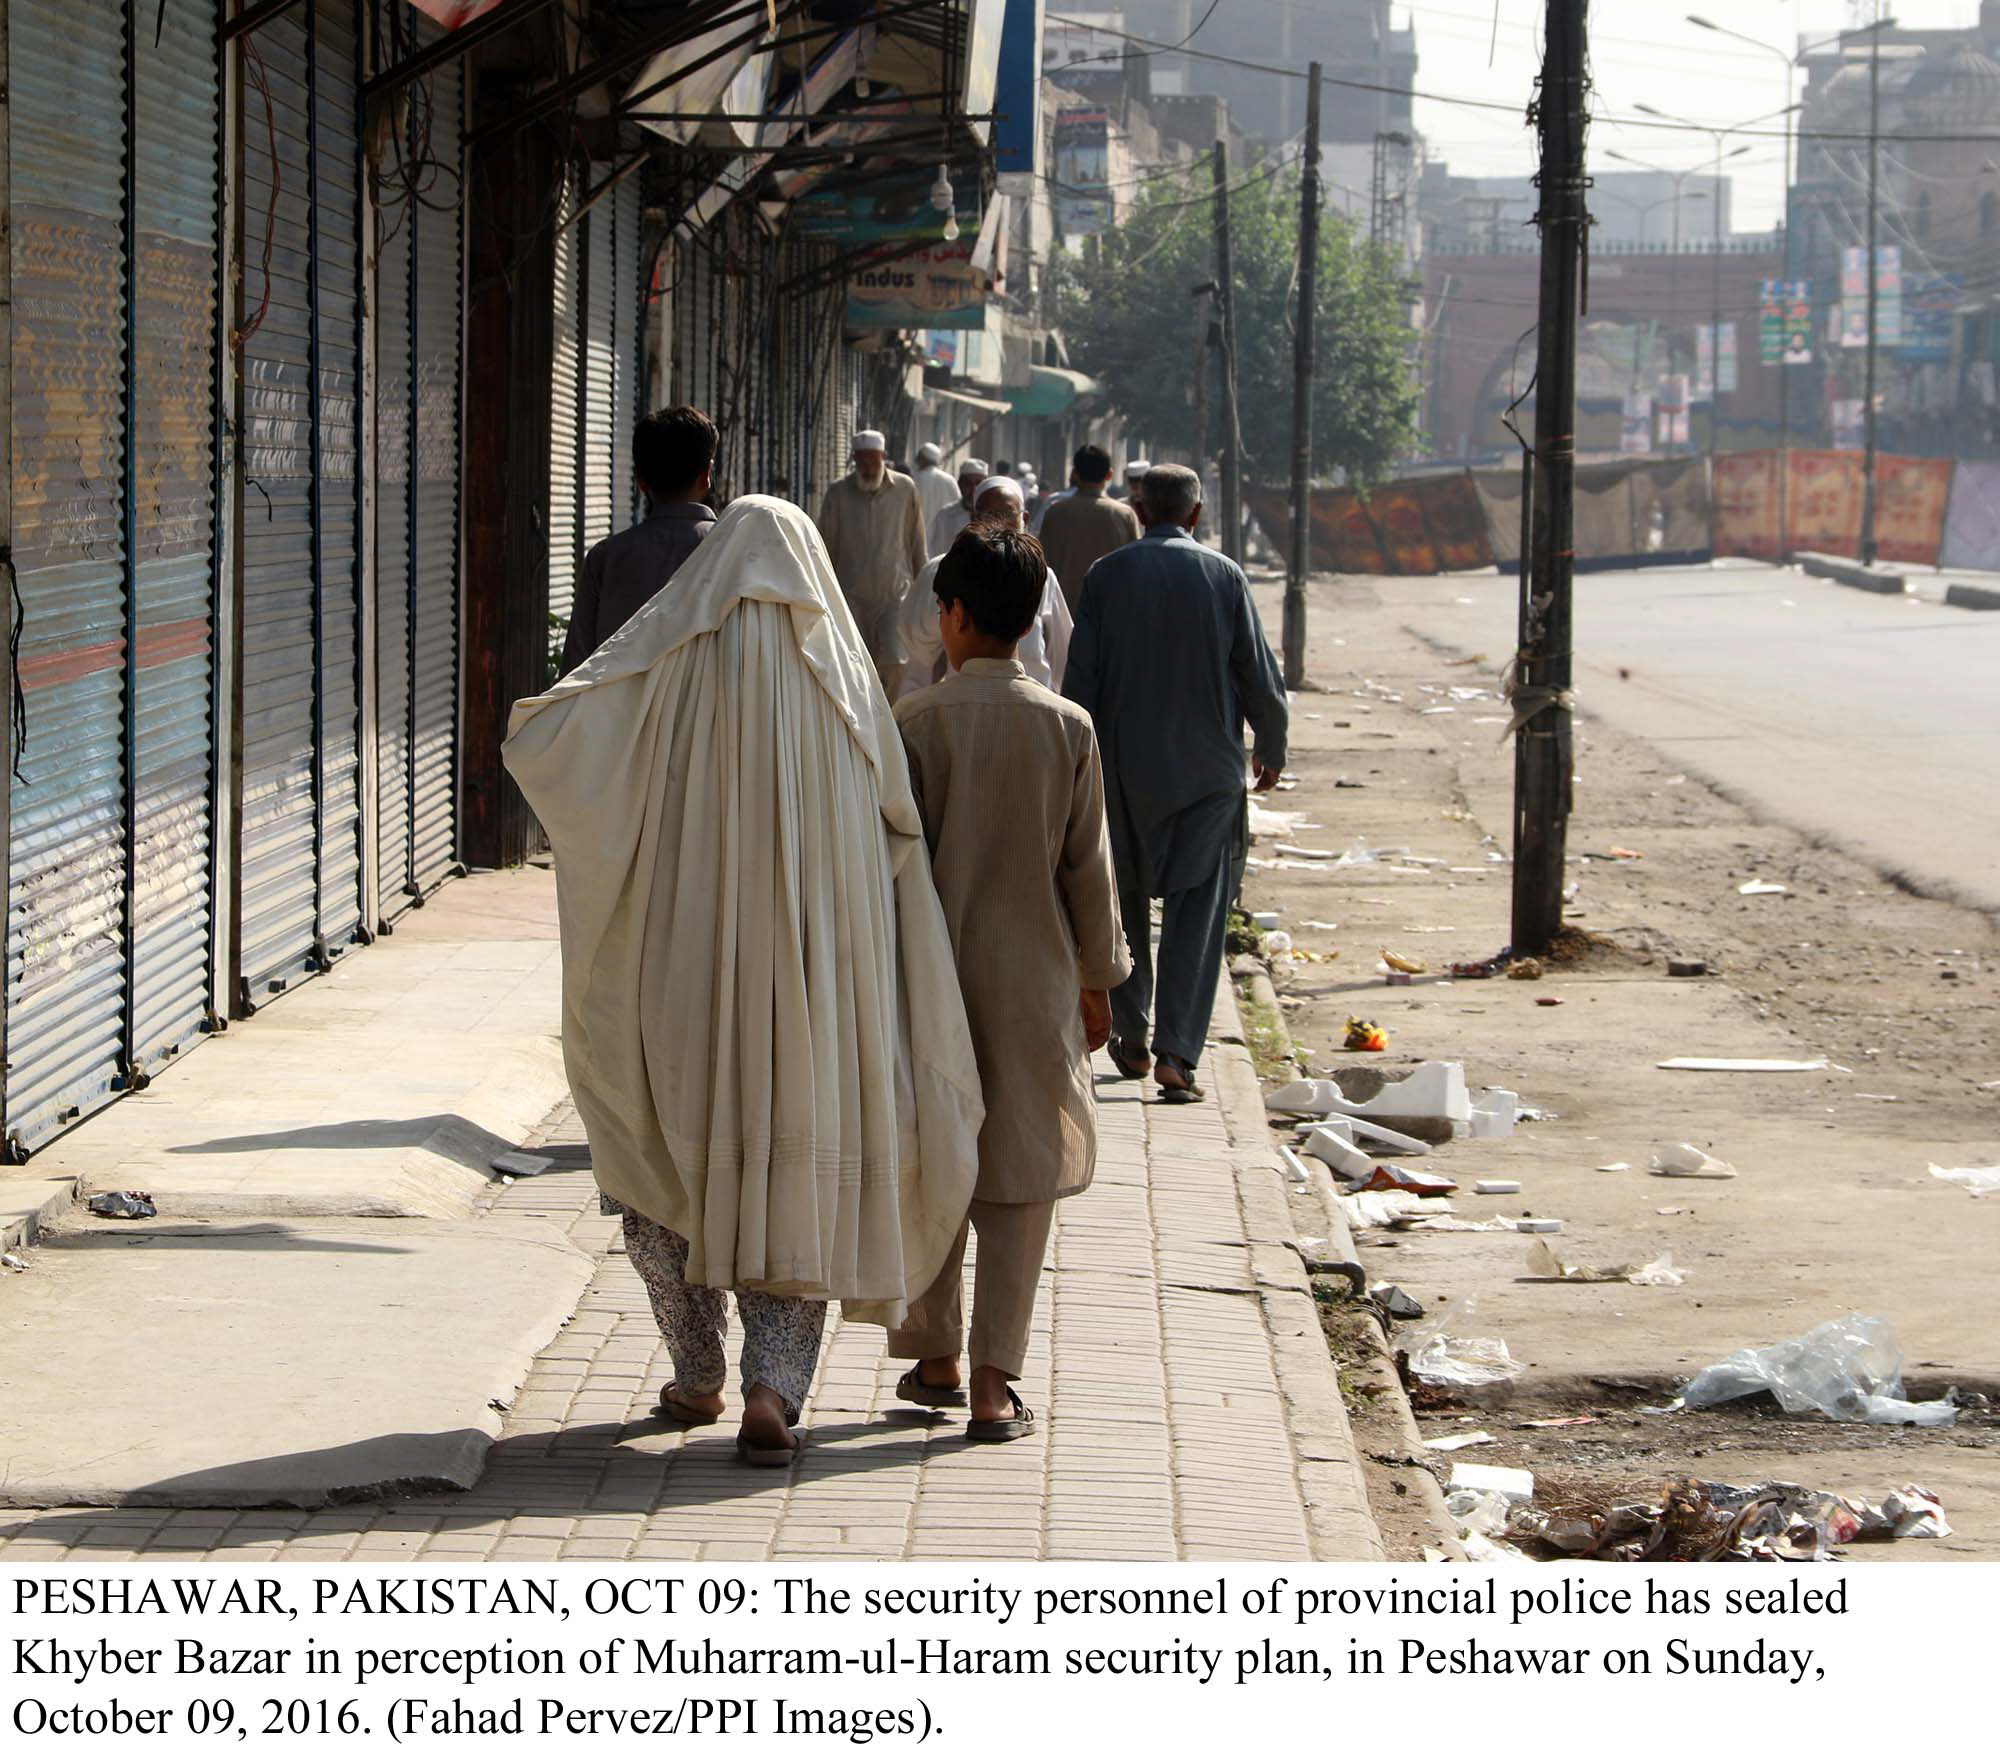 marginal decline in maternal child deaths in pakistan says study